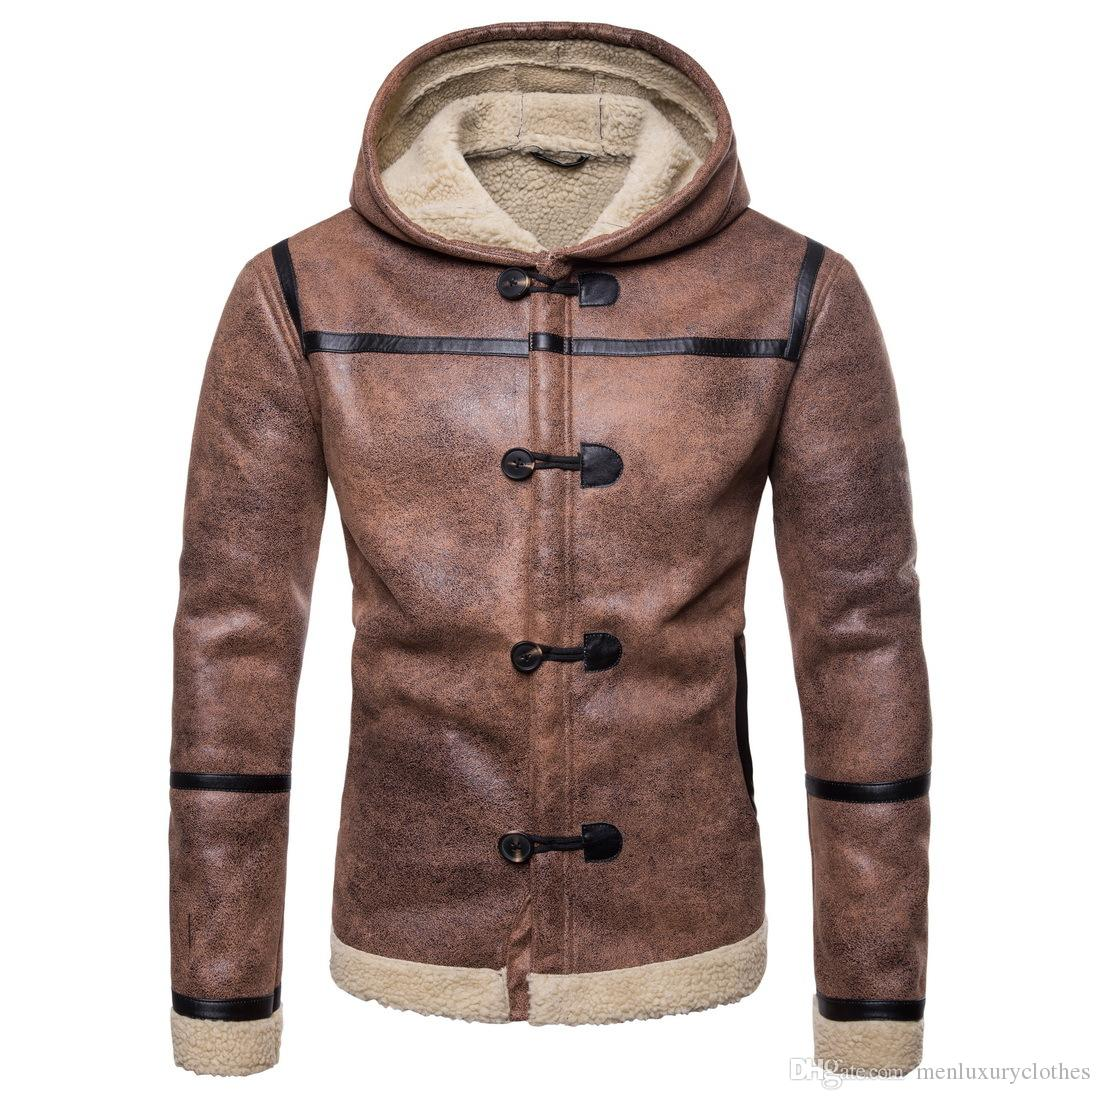 e617fcf515 Male Fashion Brown PU Leather Coats Winter Thick Designer EU Size  Motorbiker Cool Coats Jackets Male Fashion Brown PU Leather Coats Slim Fit  Designer ...